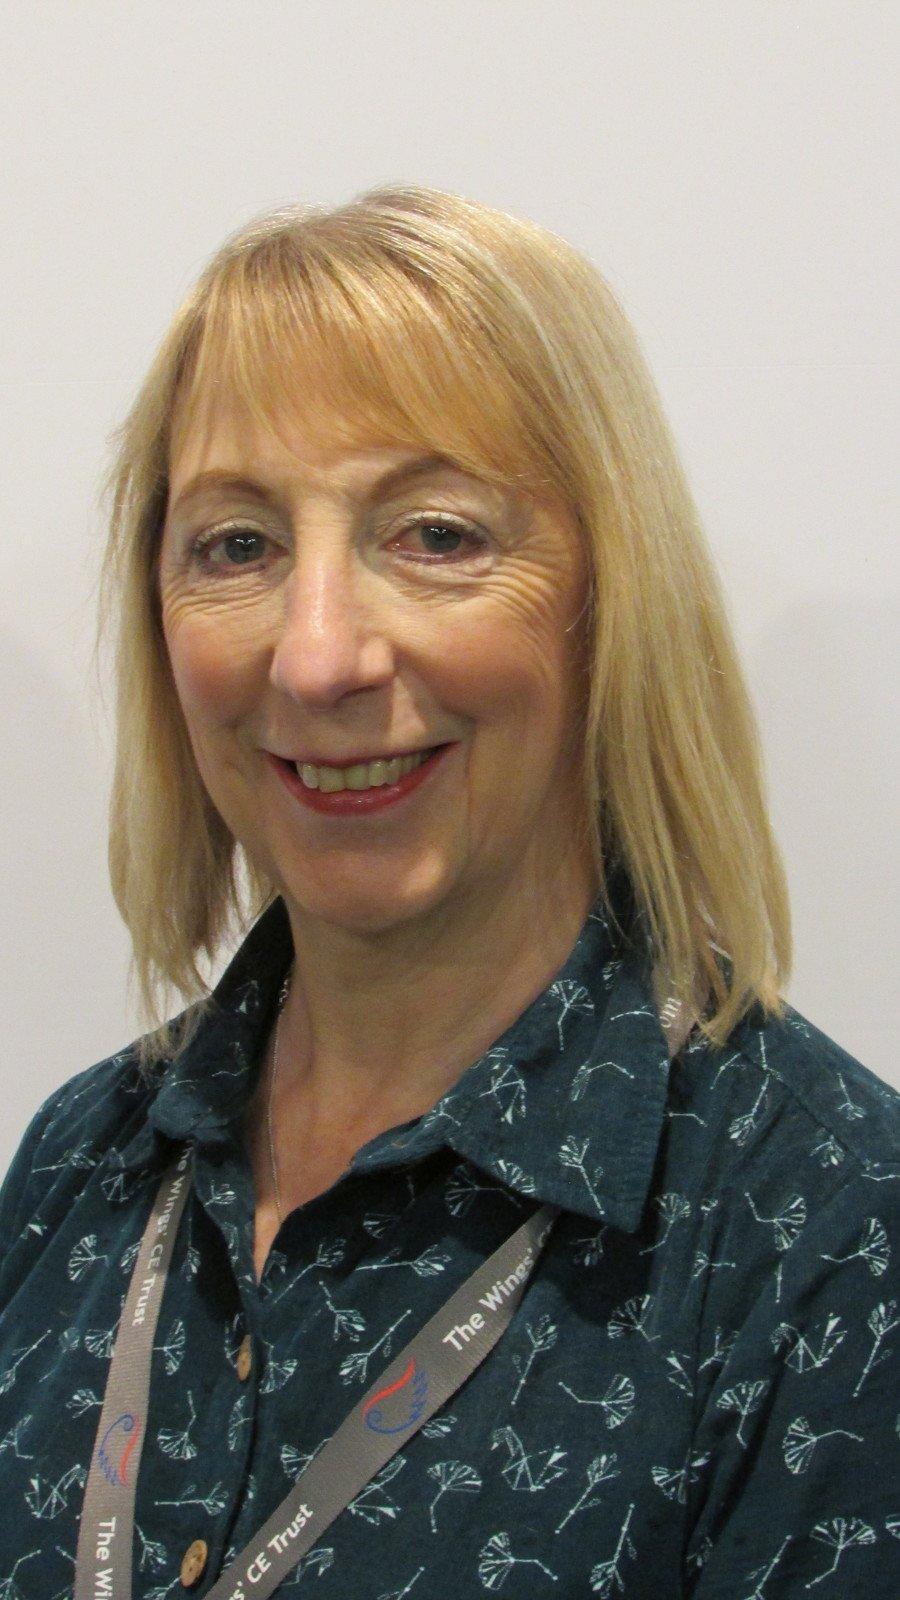 Carole Sinclair